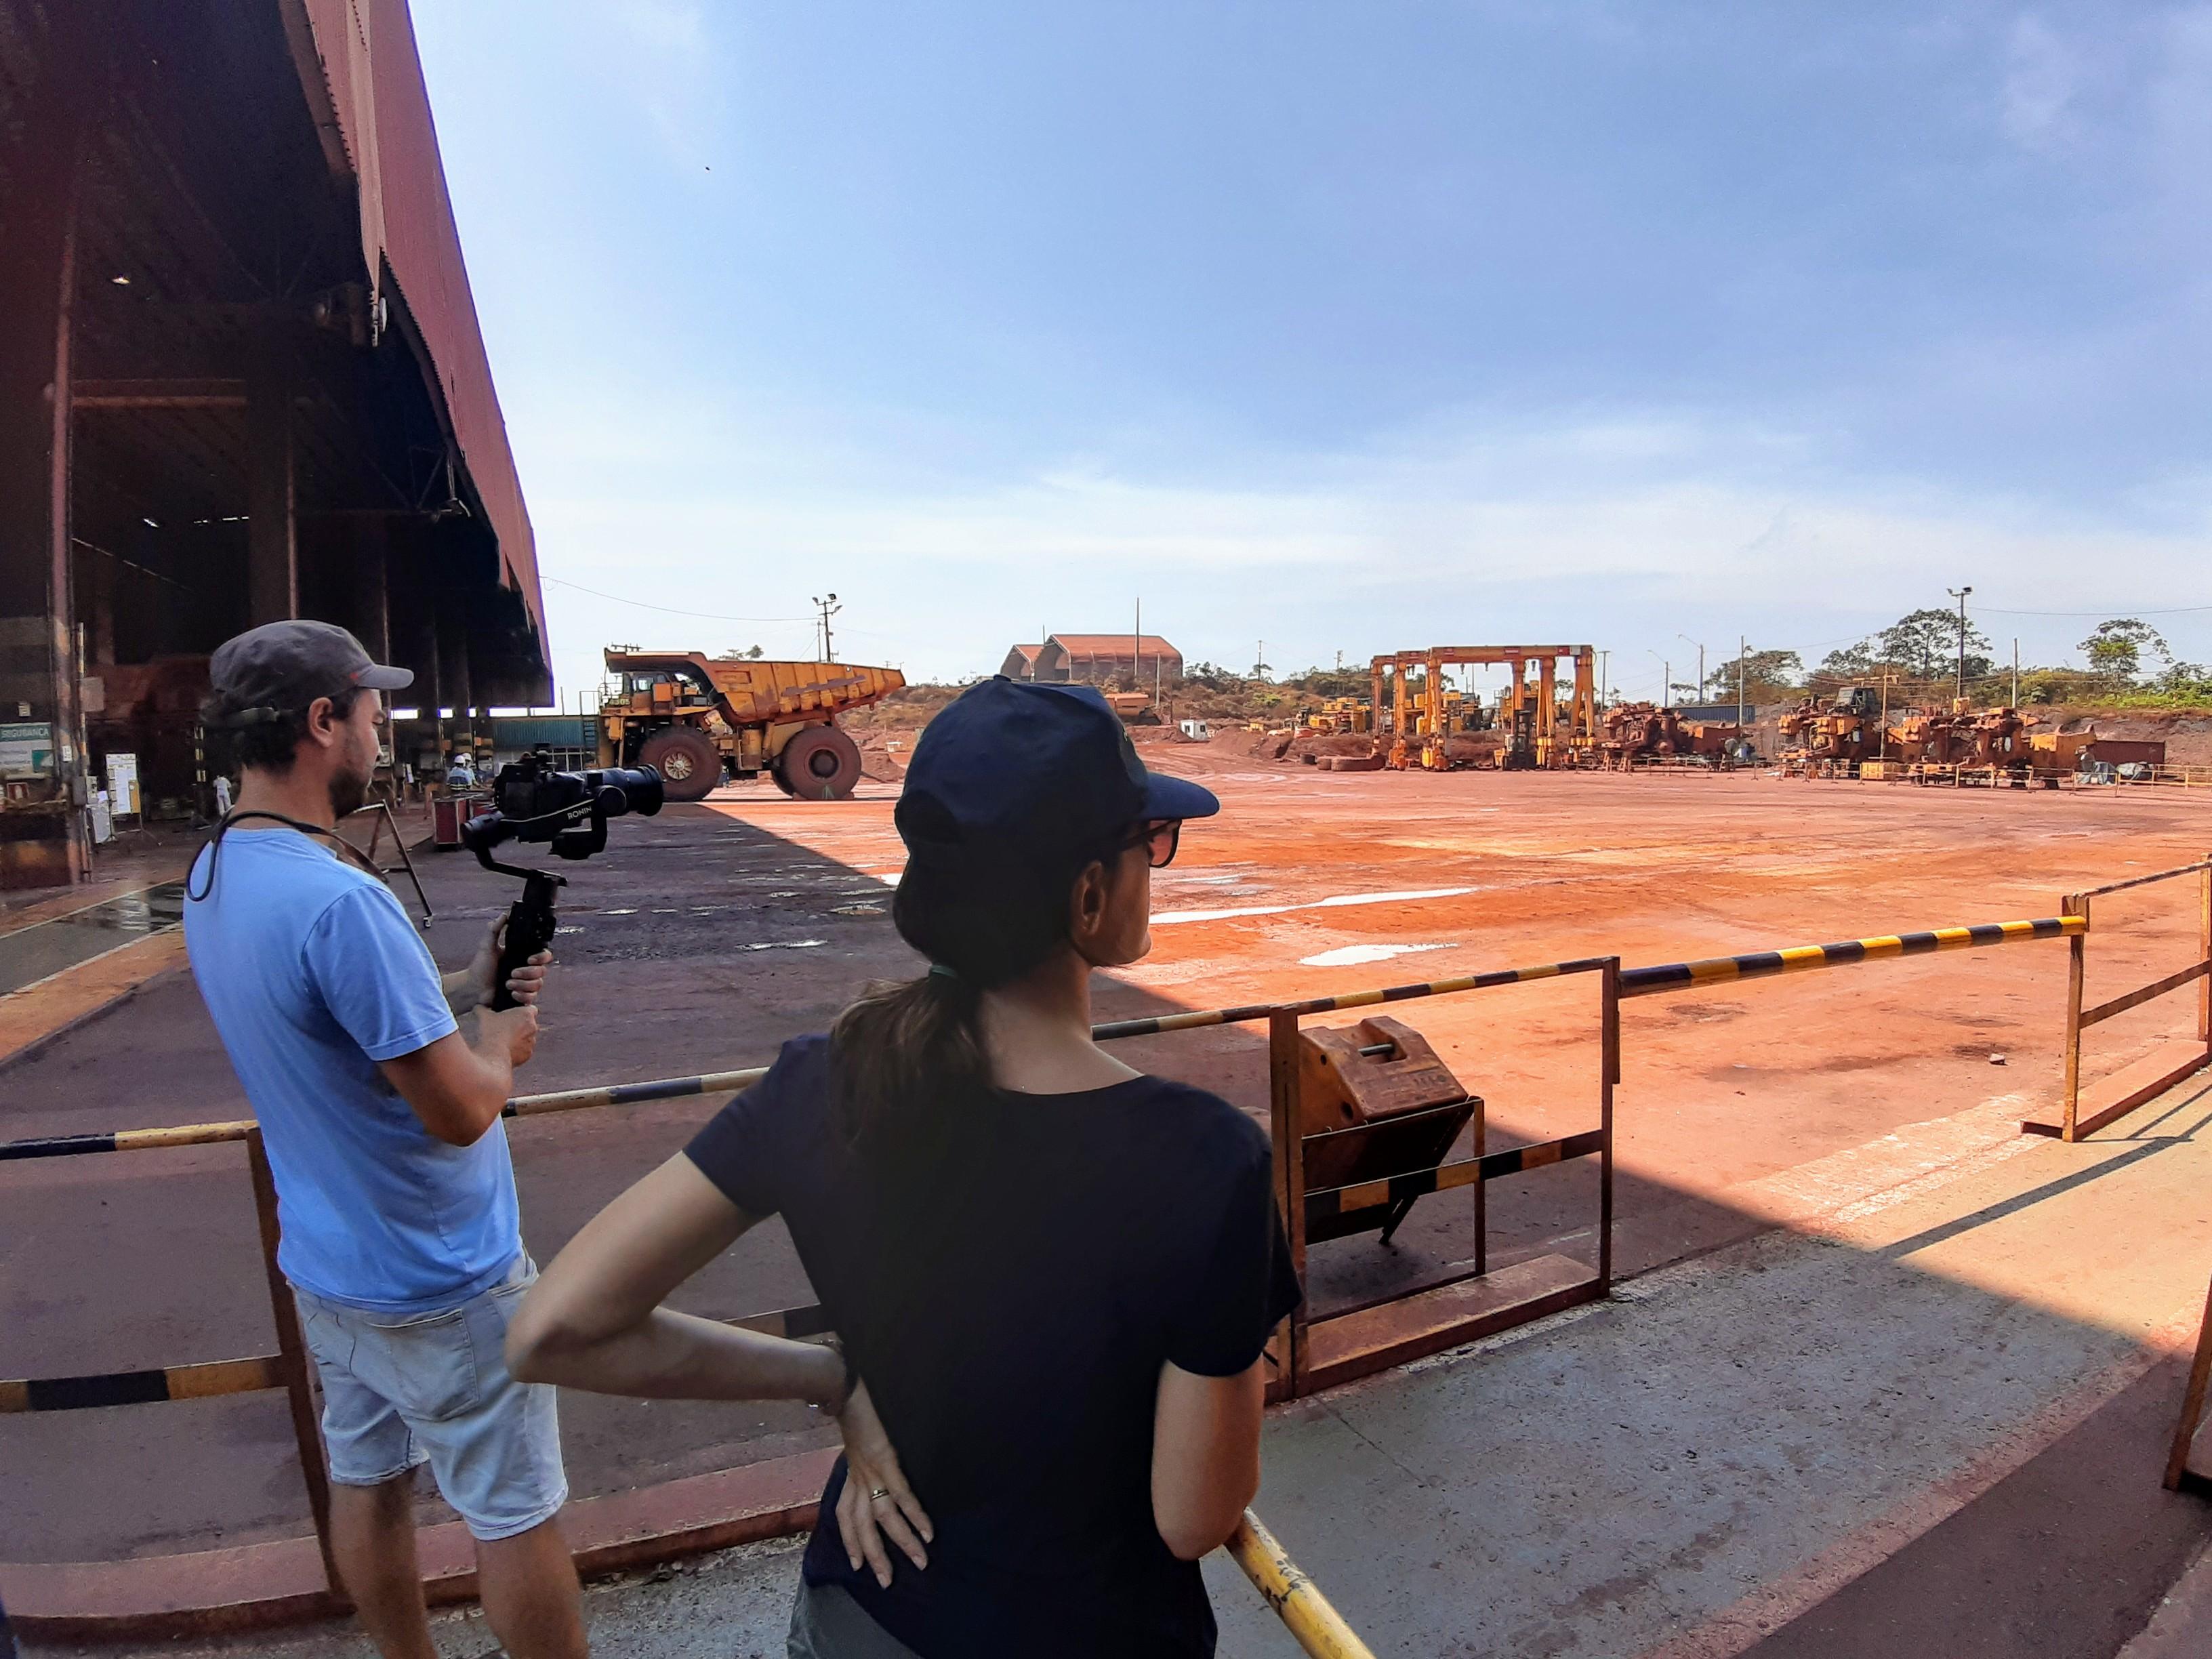 documentario acciaio brasile mani tese 2019